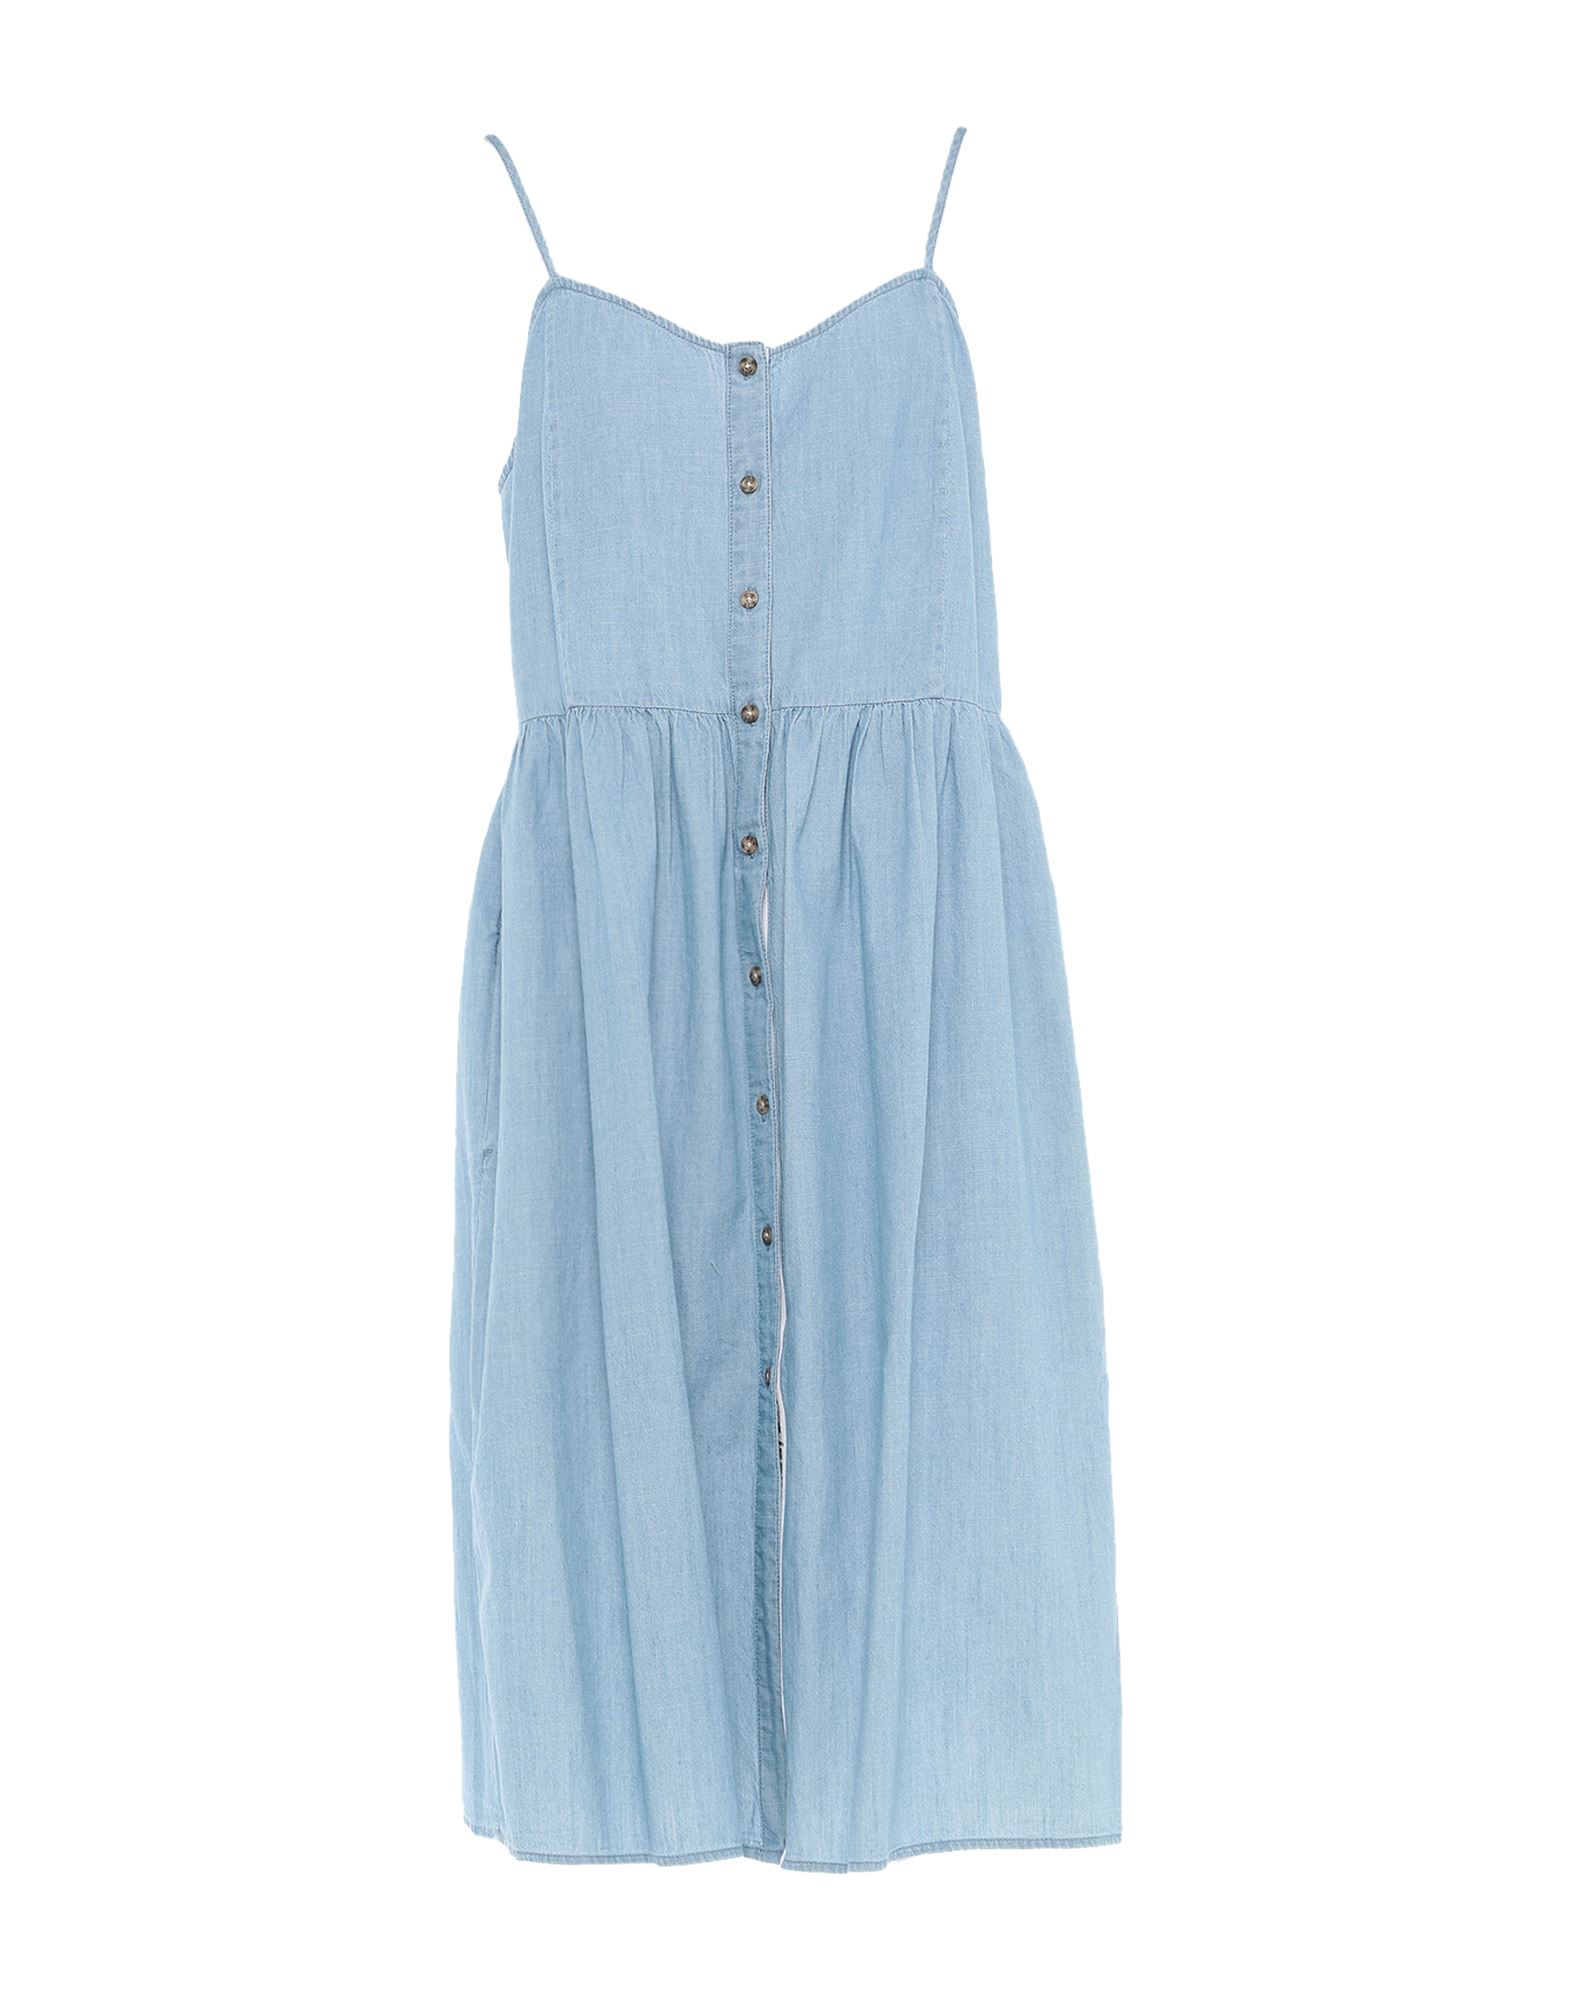 Фото - TOMMY JEANS Платье до колена платье tommy jeans dw0dw07907 c87 twilight navy